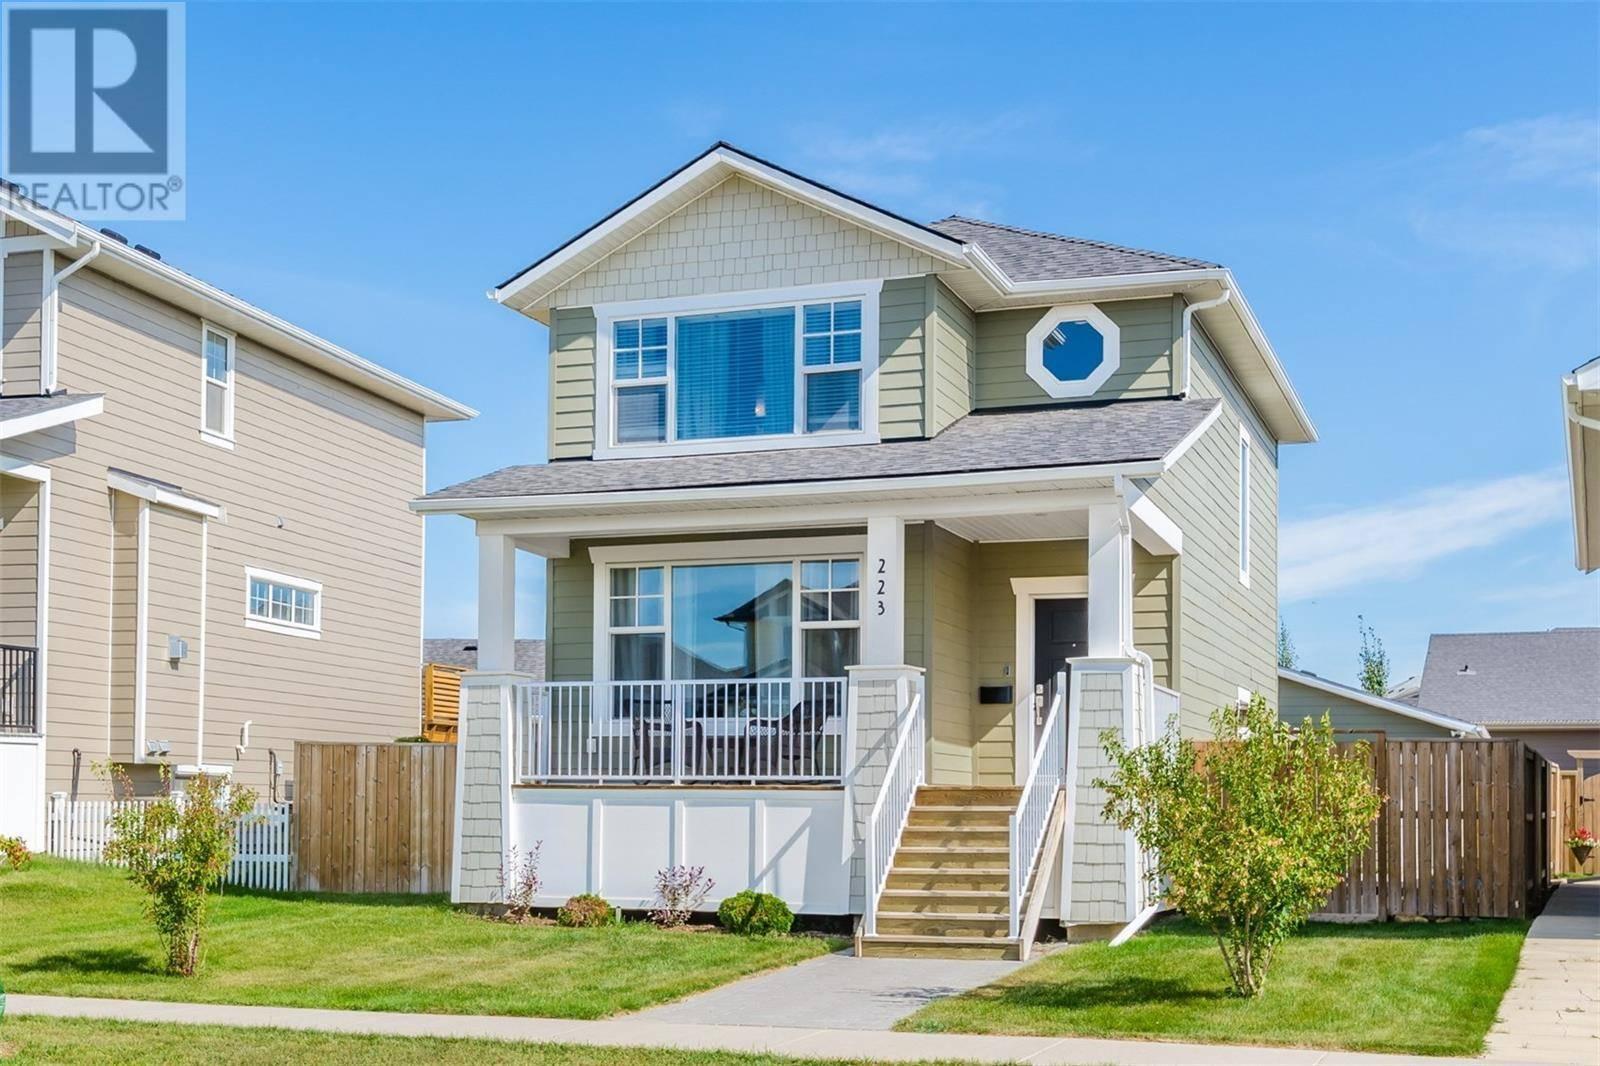 House for sale at 223 Meadows Blvd Saskatoon Saskatchewan - MLS: SK784552